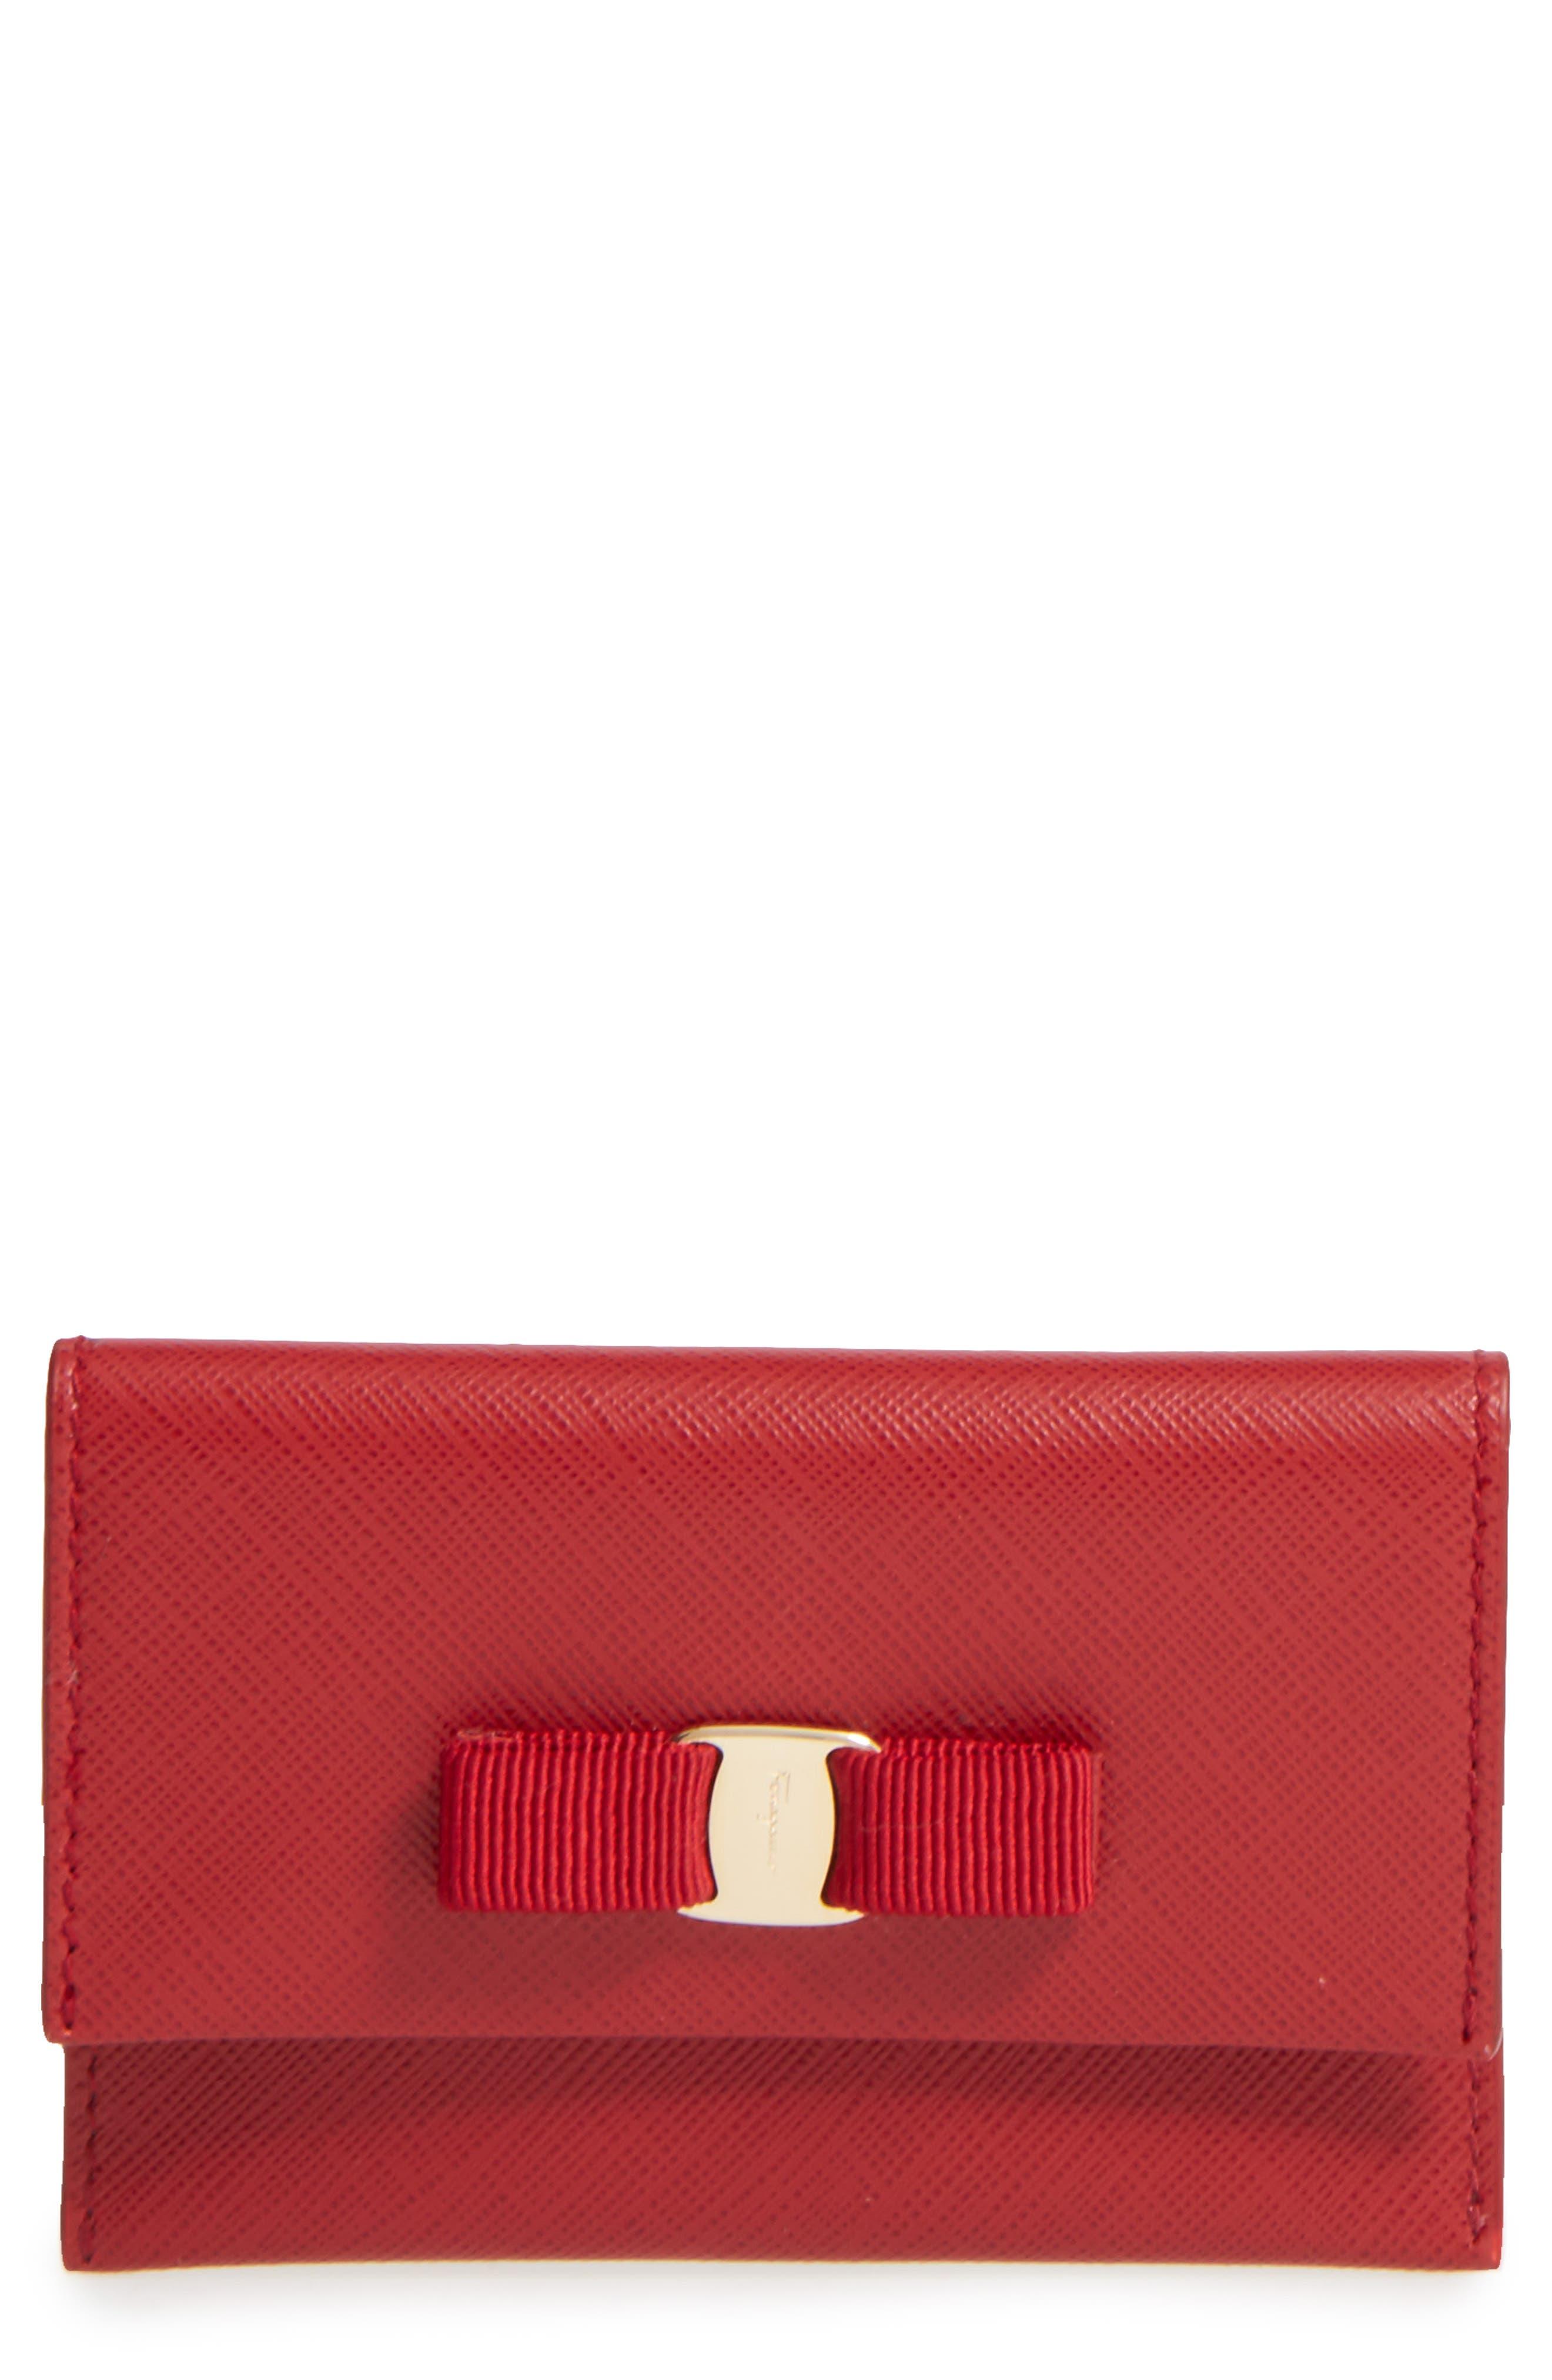 Vara Leather Card Case,                             Main thumbnail 1, color,                             600